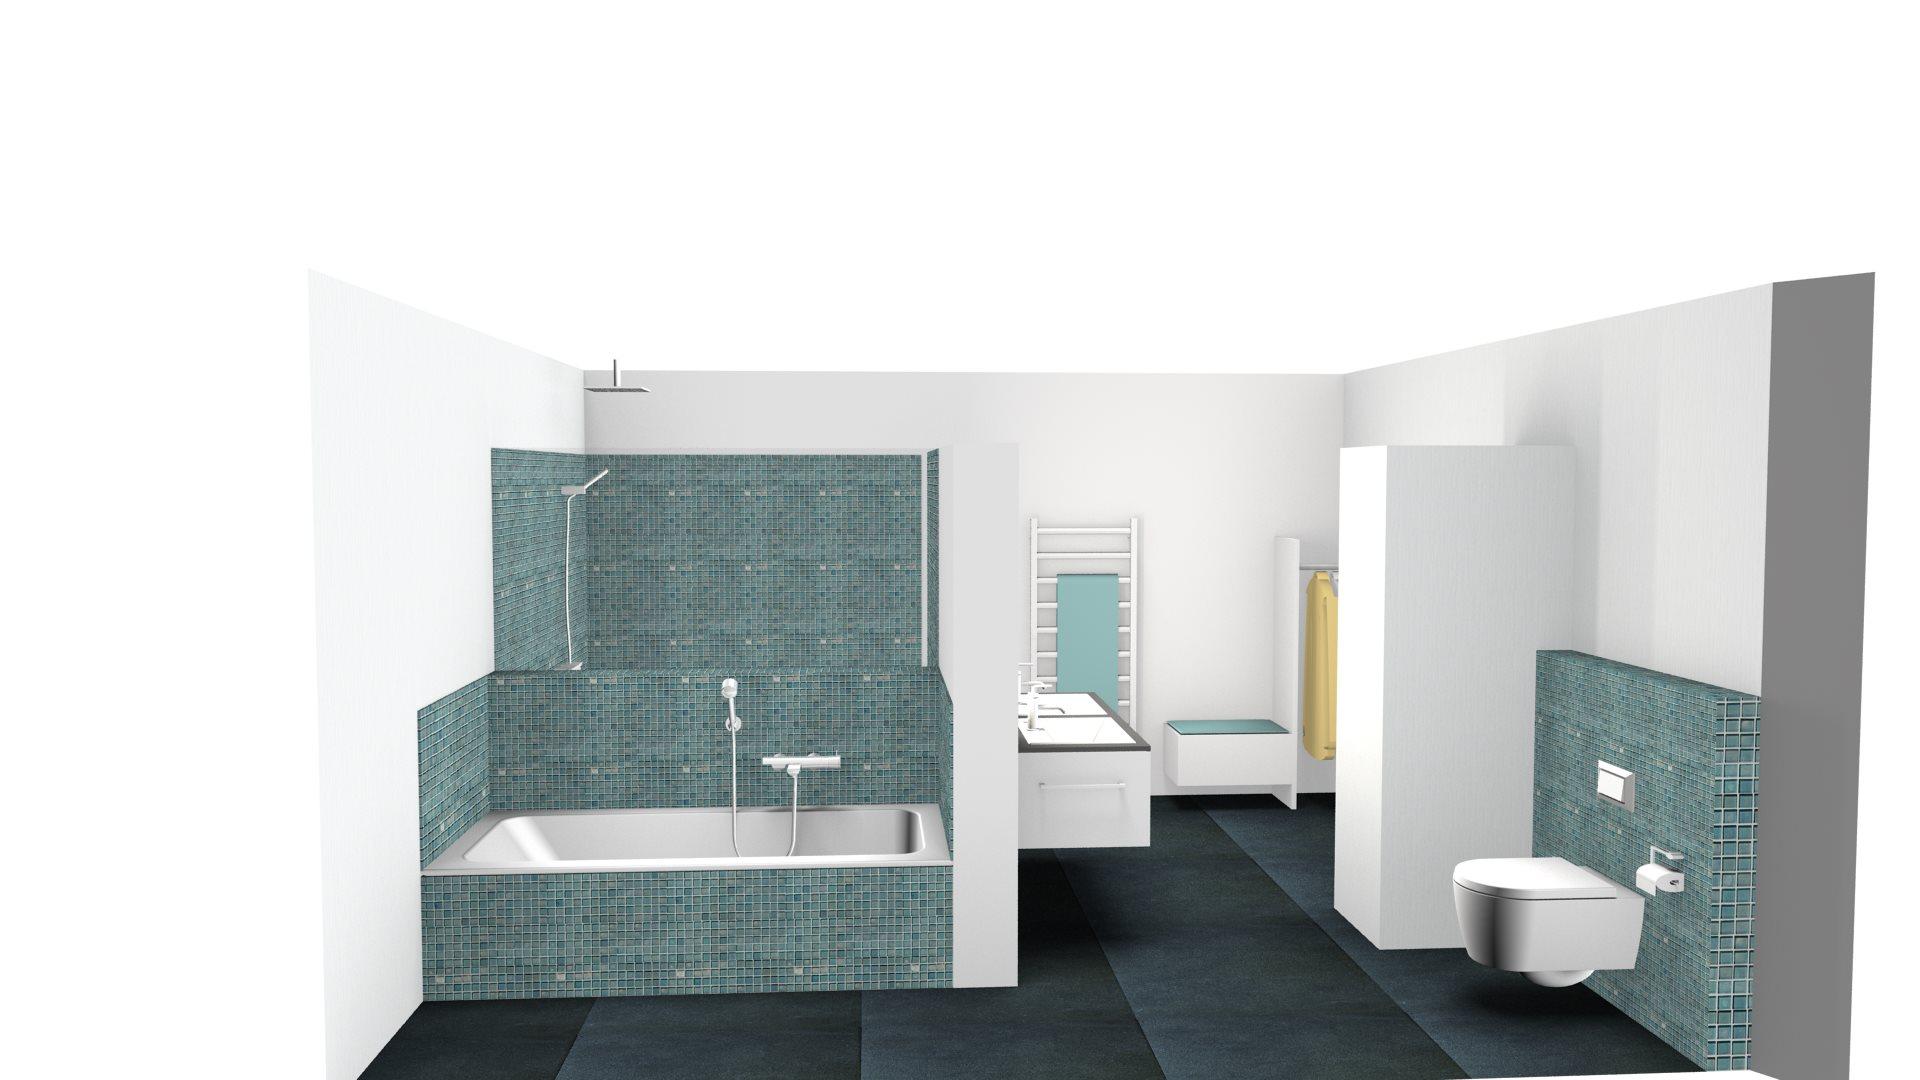 actica gmbh actica planen einrichten 3d planung bad. Black Bedroom Furniture Sets. Home Design Ideas